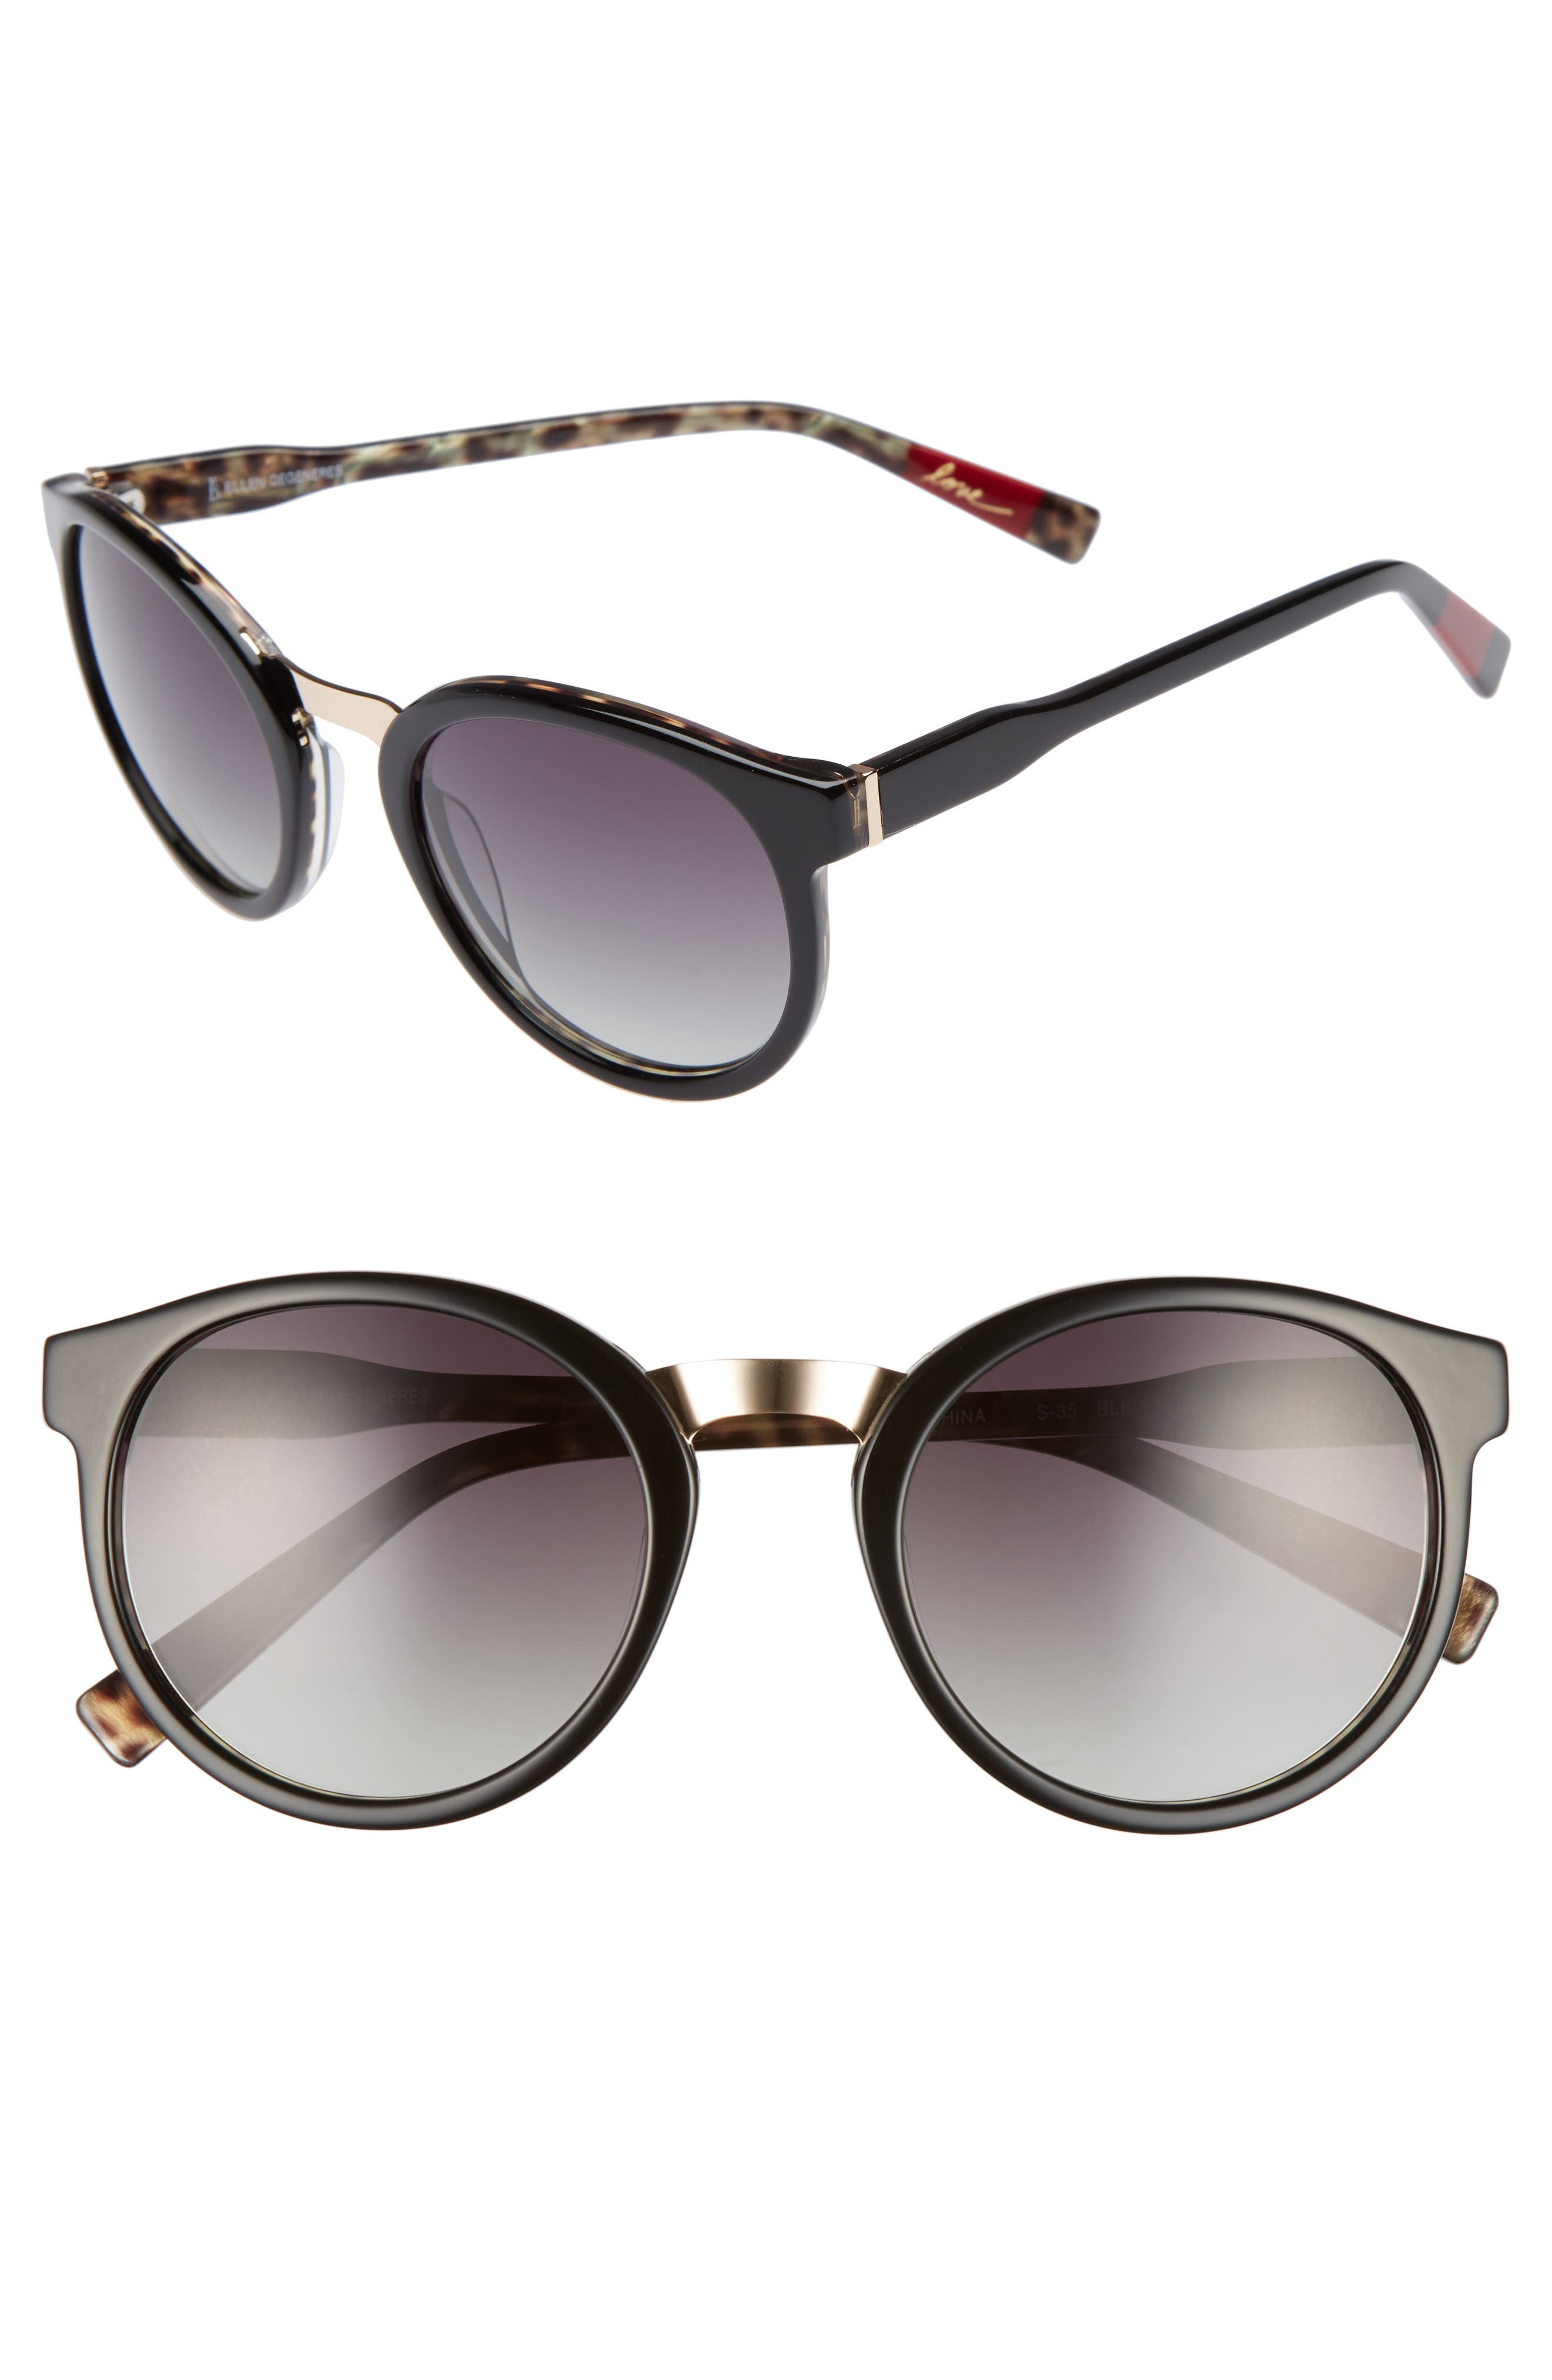 53mm Round Sunglasses,                         Main,                         color, 001